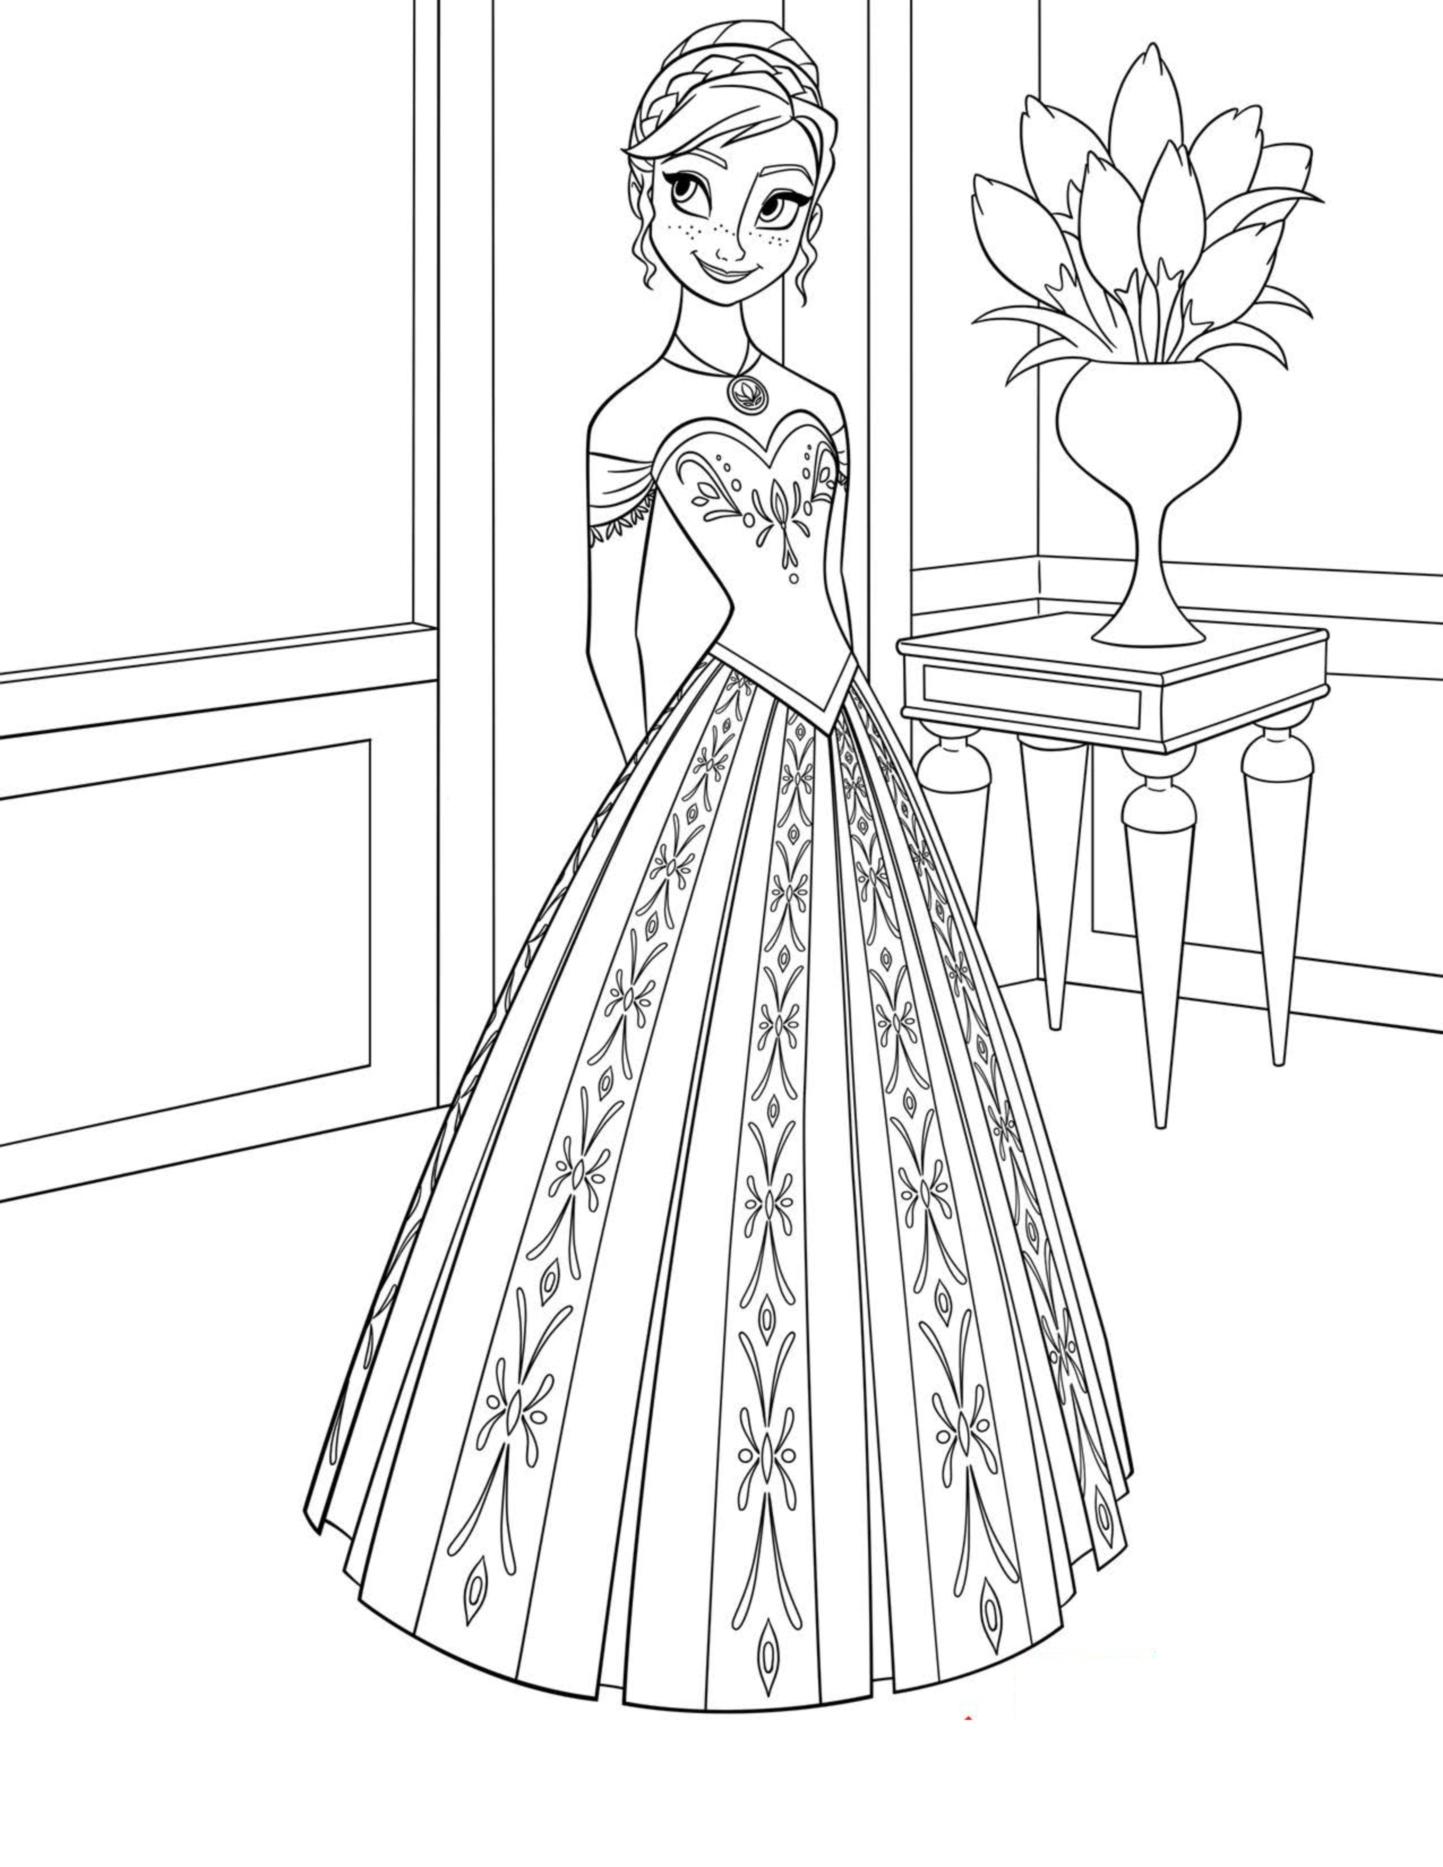 coloriage à dessiner reine des neiges disney en ligne